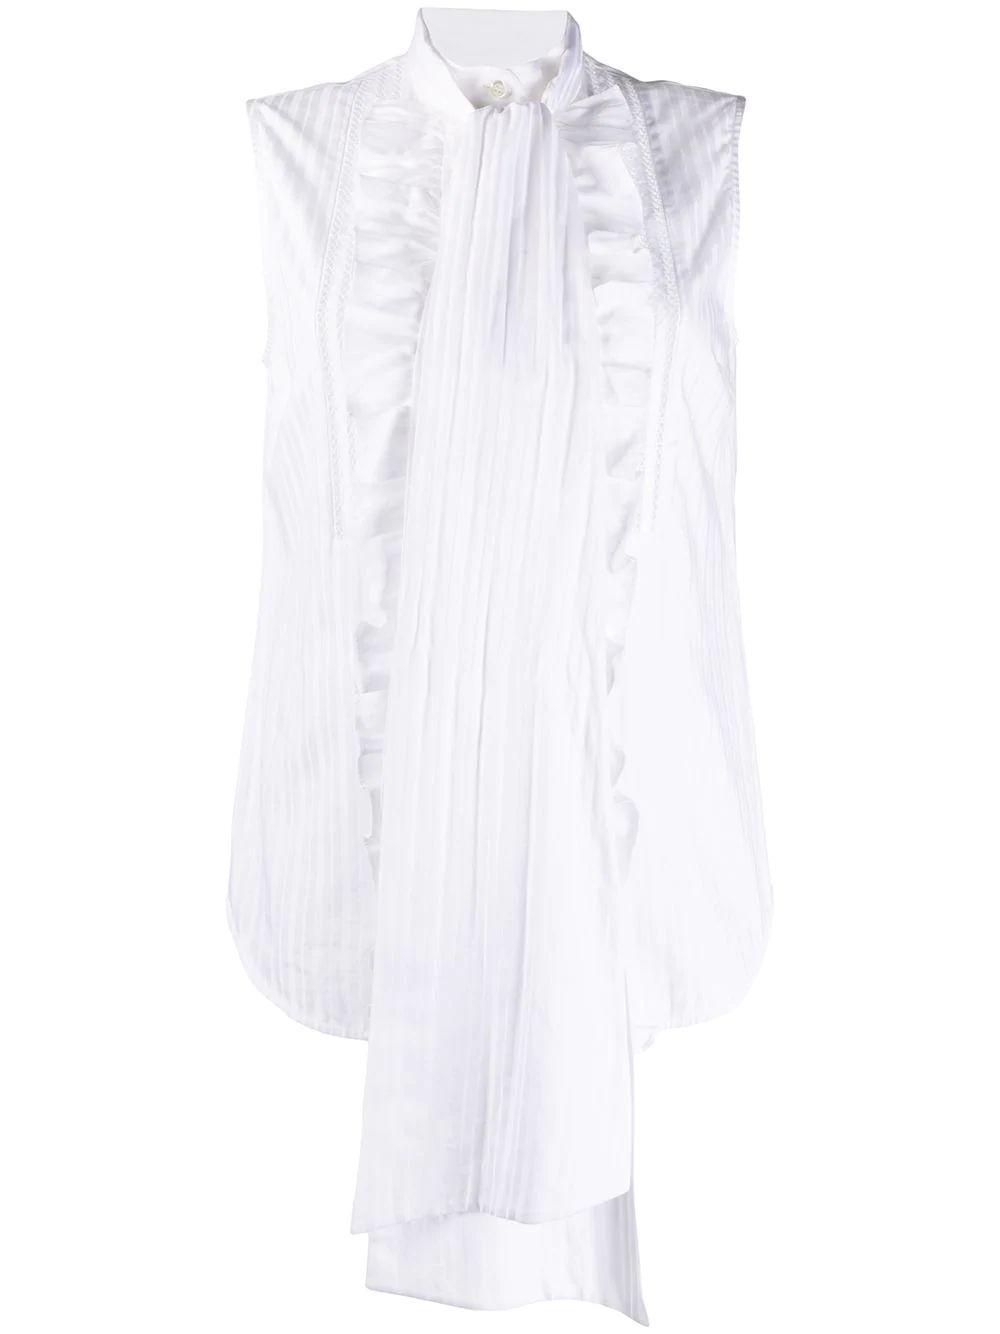 Sleeveless Cotton Tie Neck Cotton Shirt Item # 2320WSH001404A